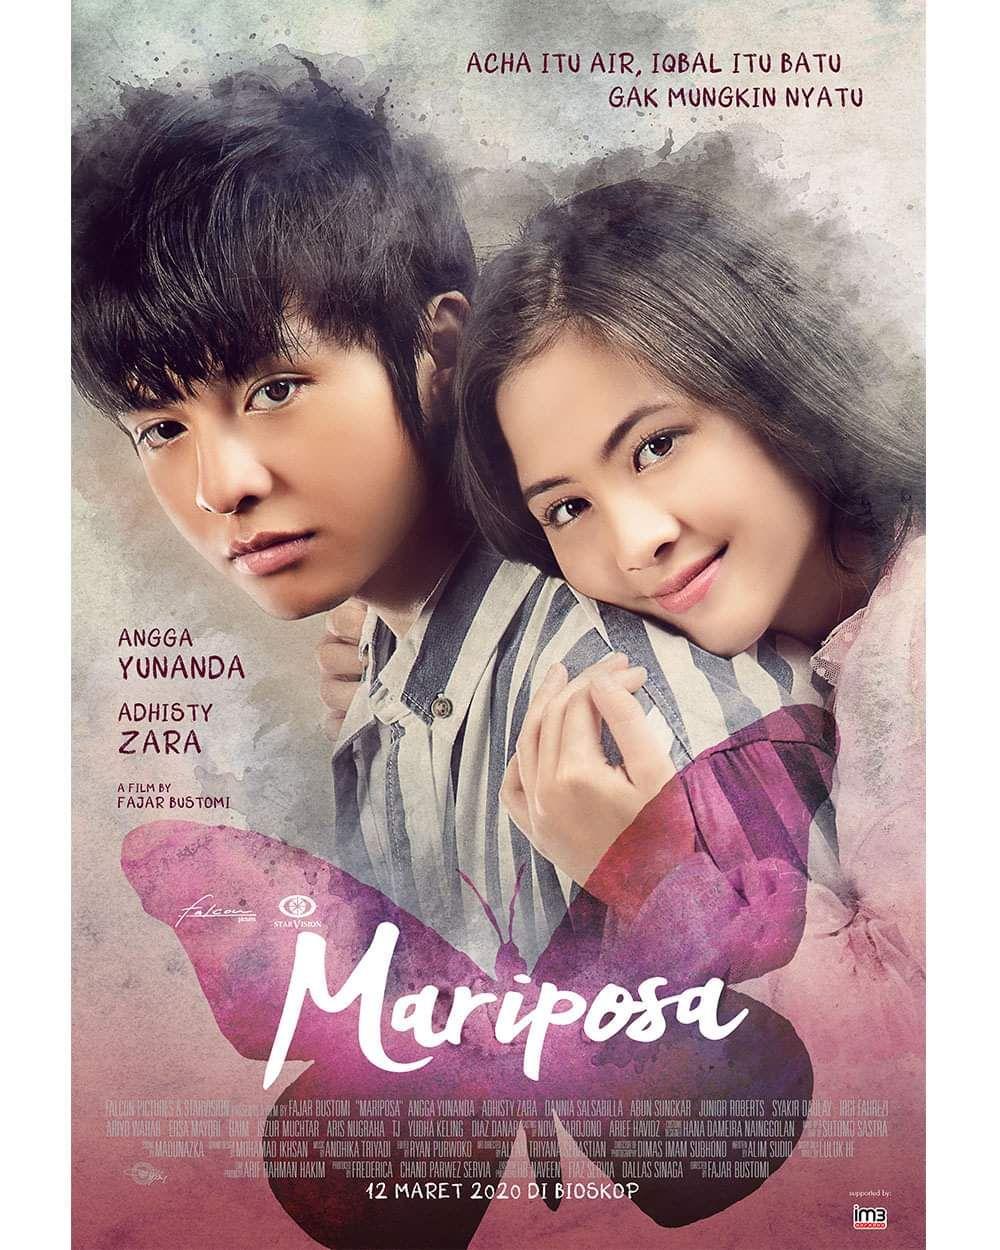 MARIPOSA di 2020 Film romantis, Film remaja, Komedi romantis